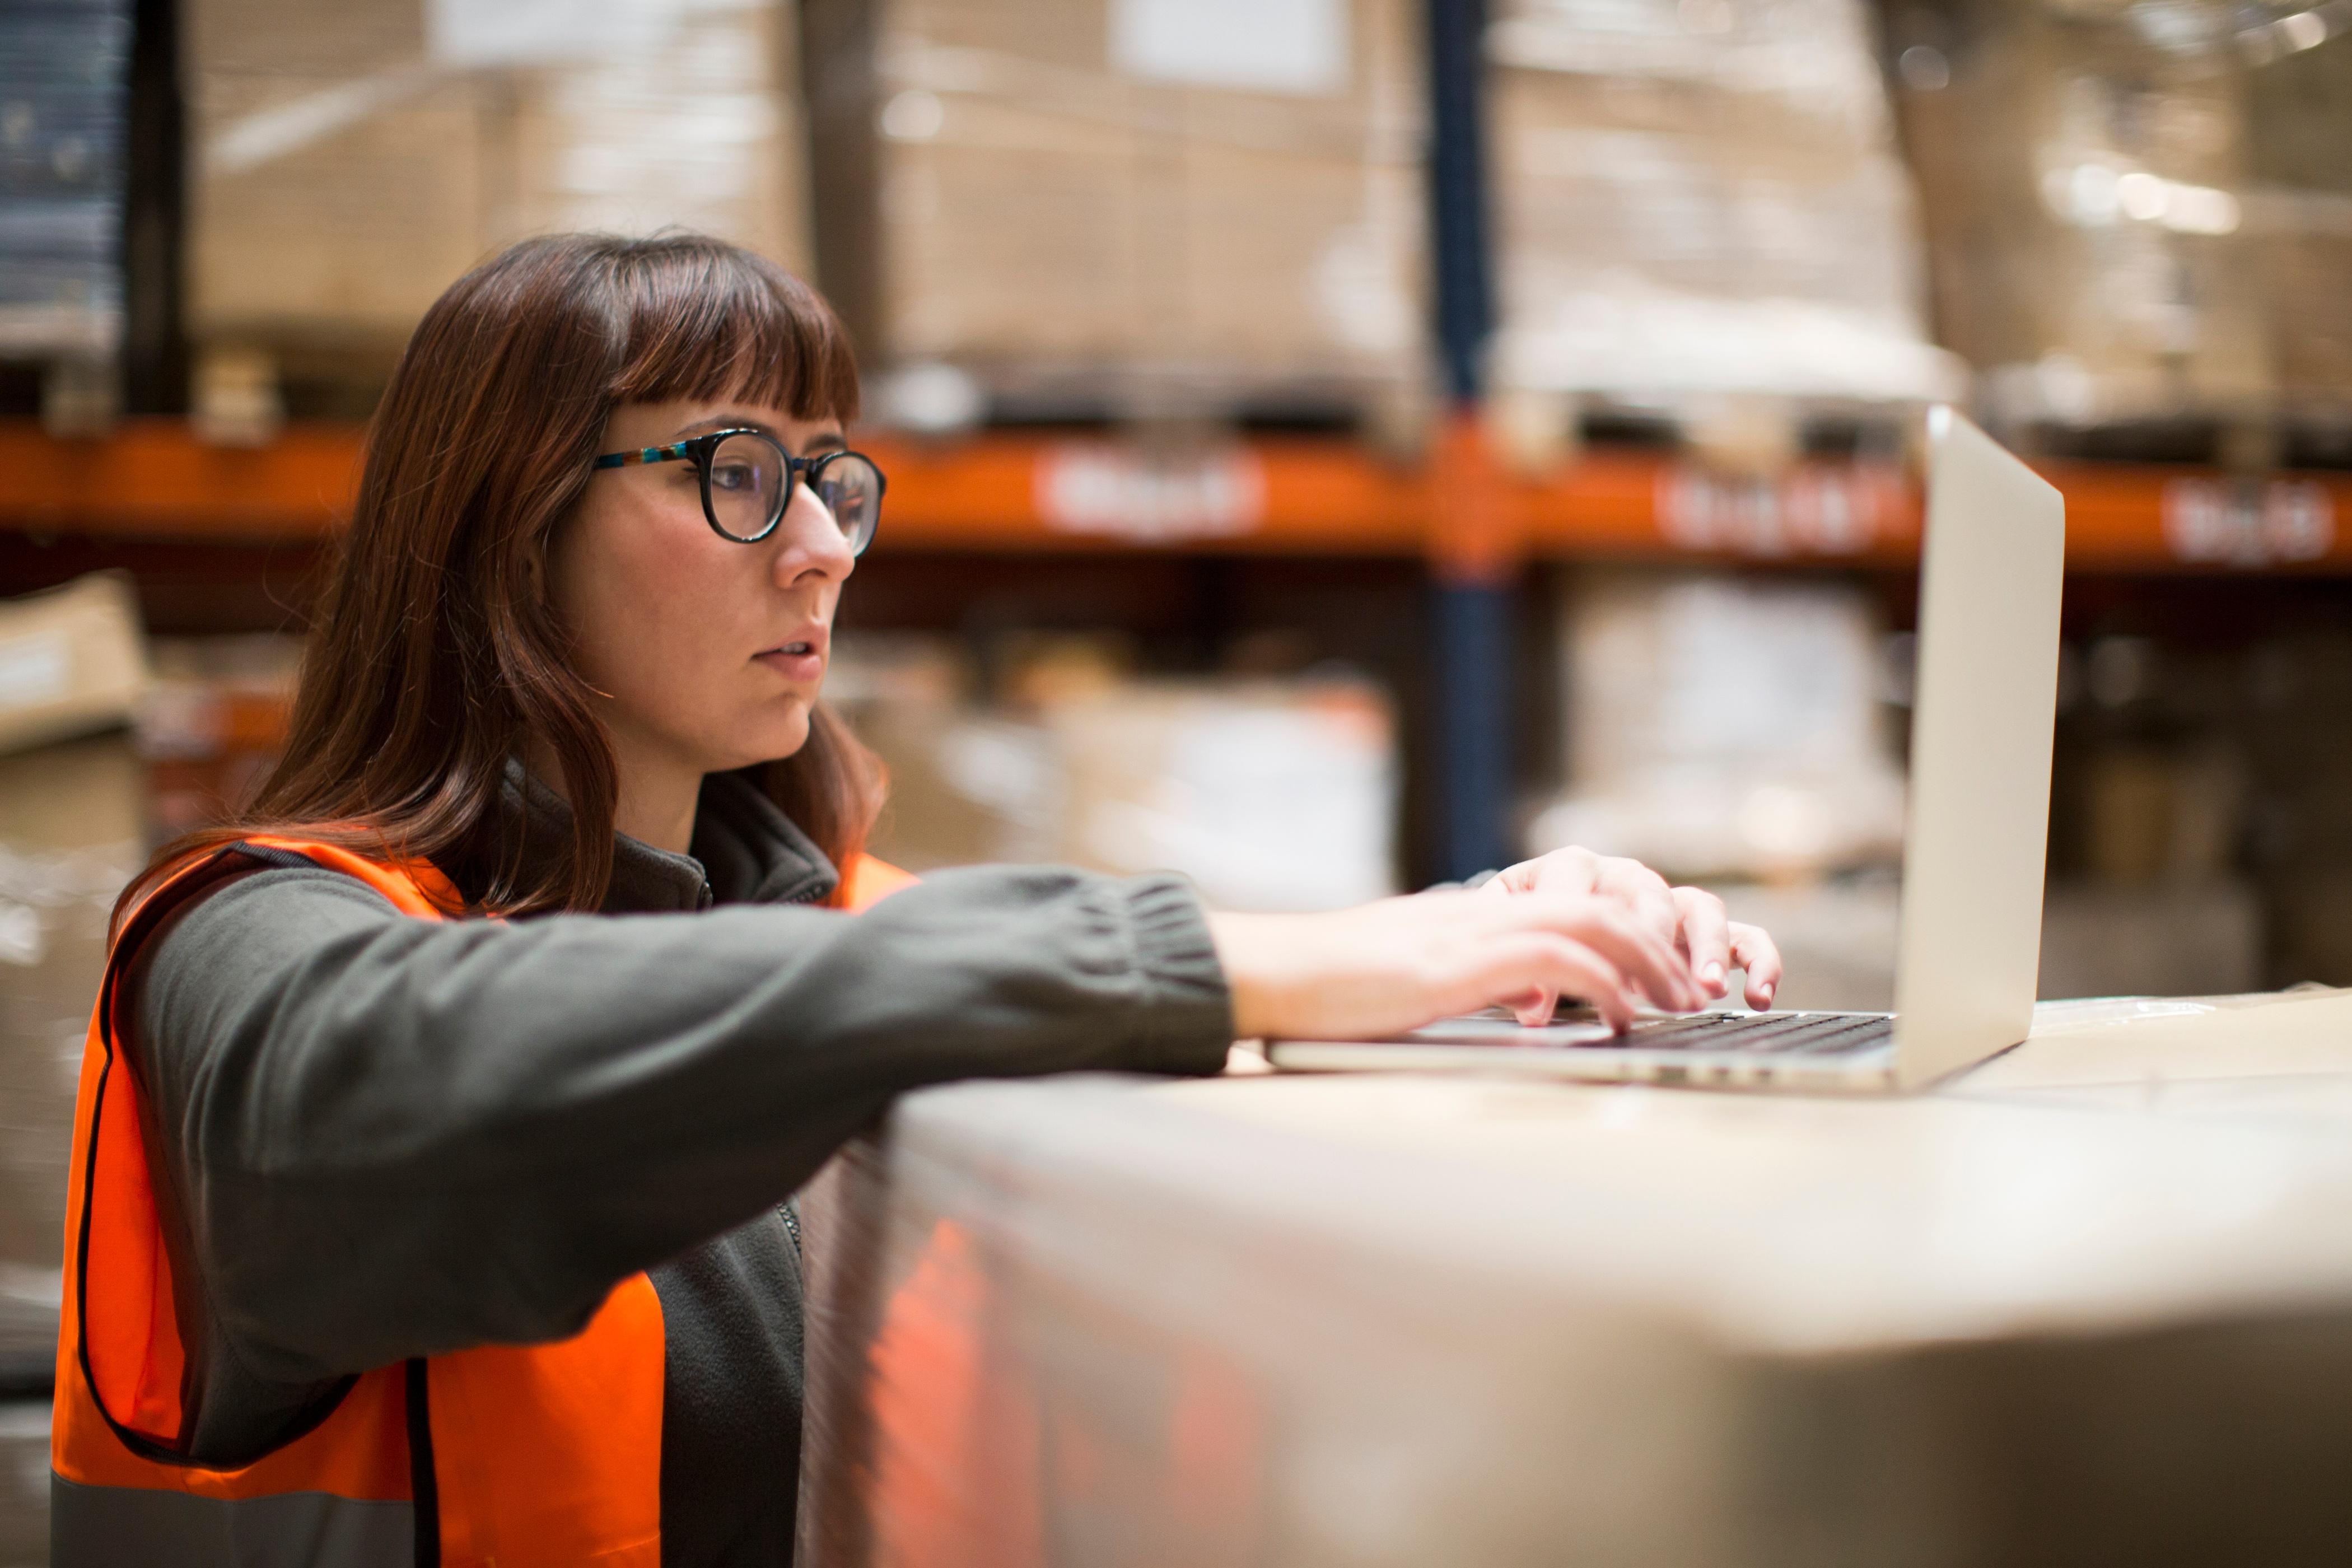 customer reviews affect recruiting